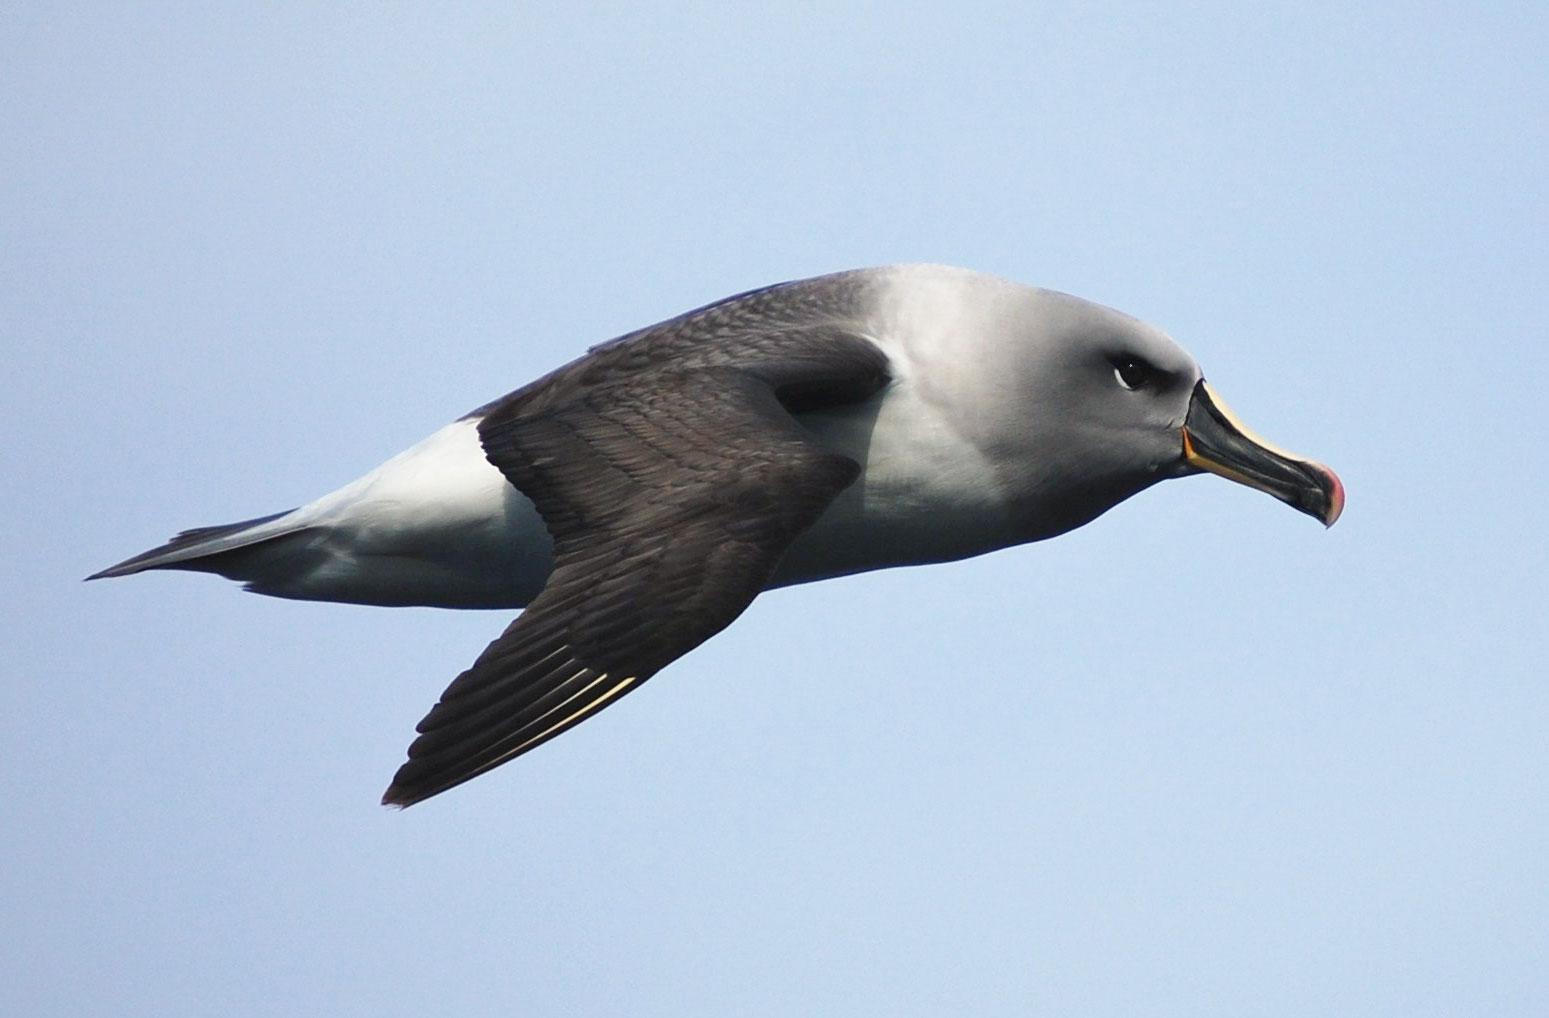 Grey-headed Albatross. Lieutenant Elizabeth Crapo/NOAA Corps